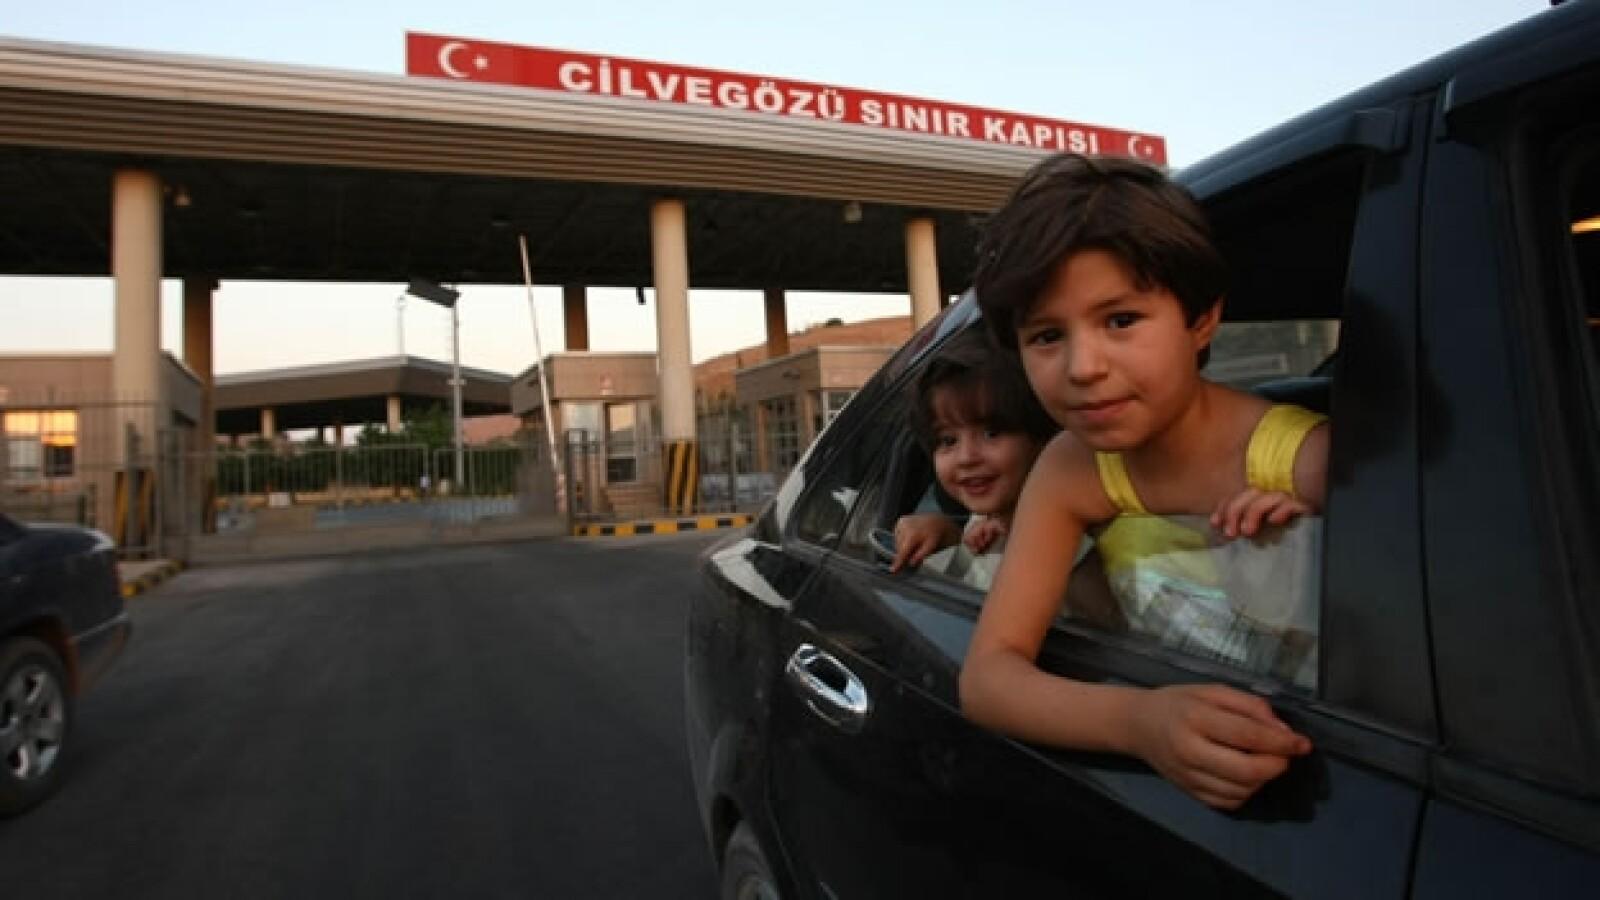 refugiados, siria, guerra, niños